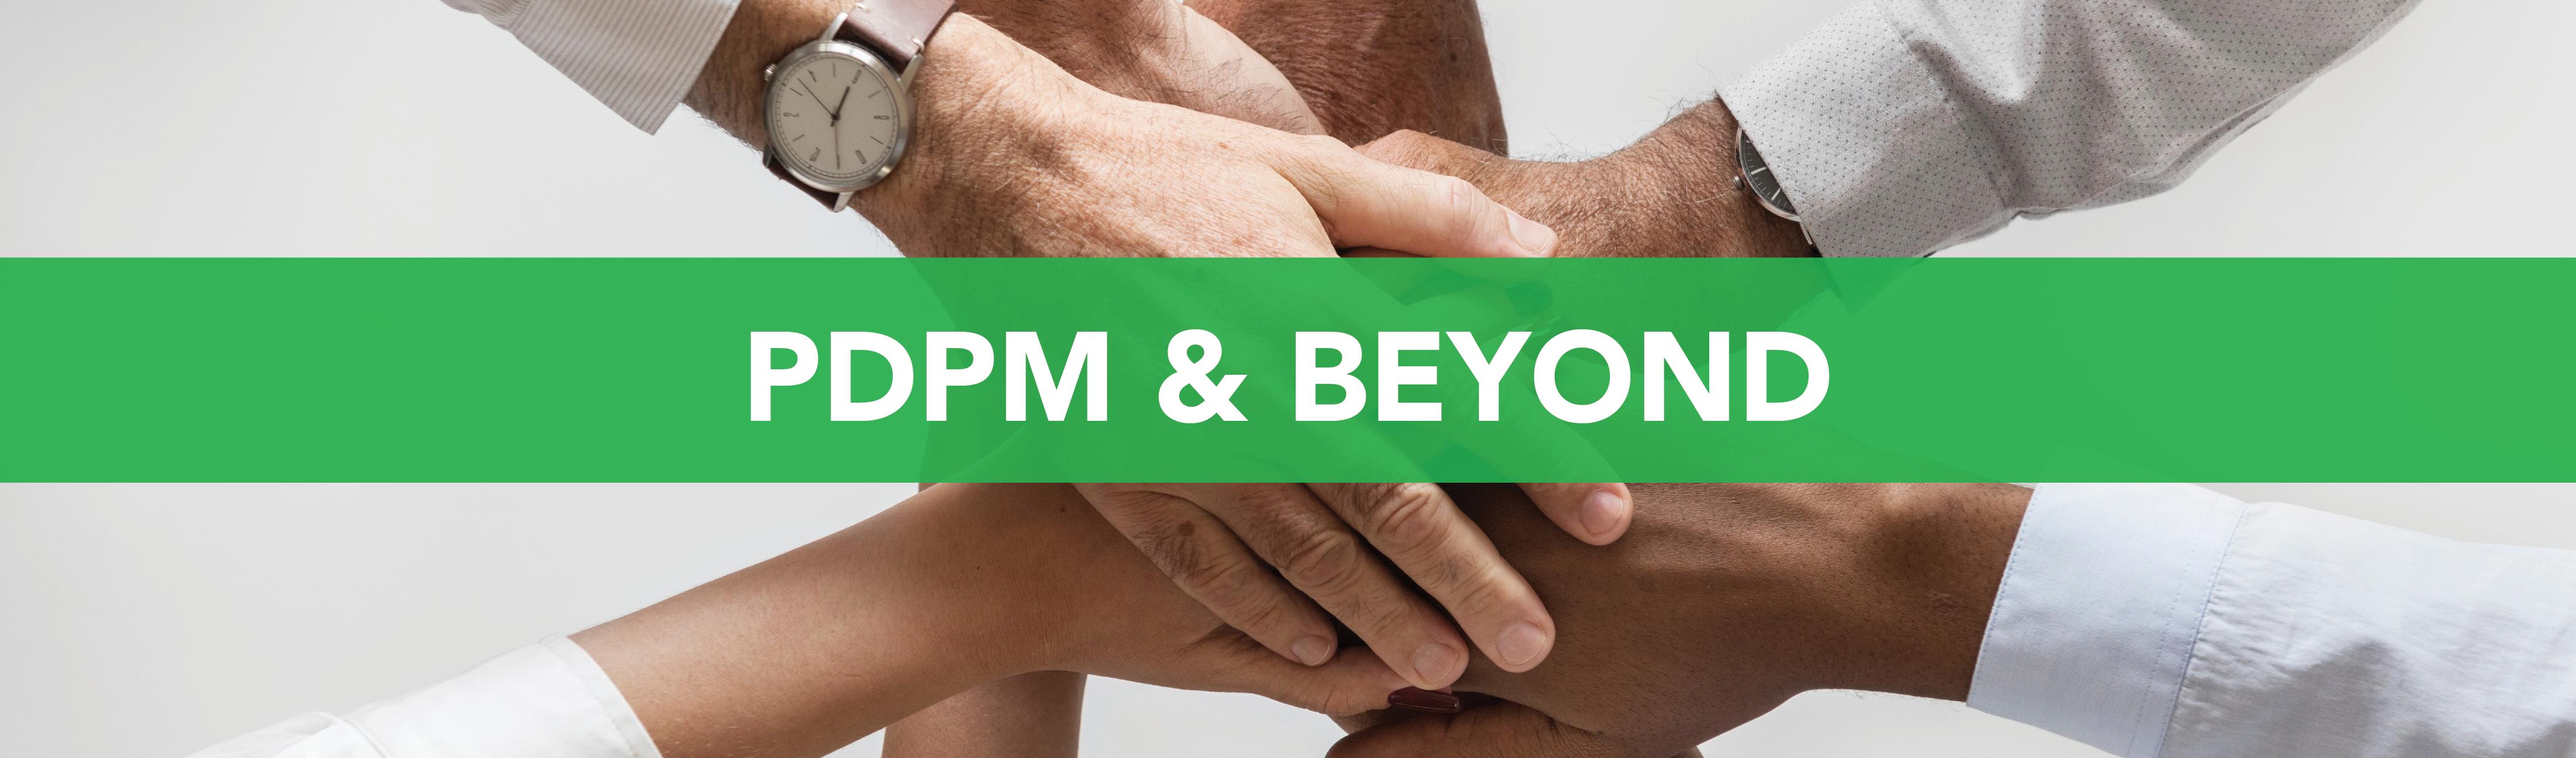 PDPM & Beyond